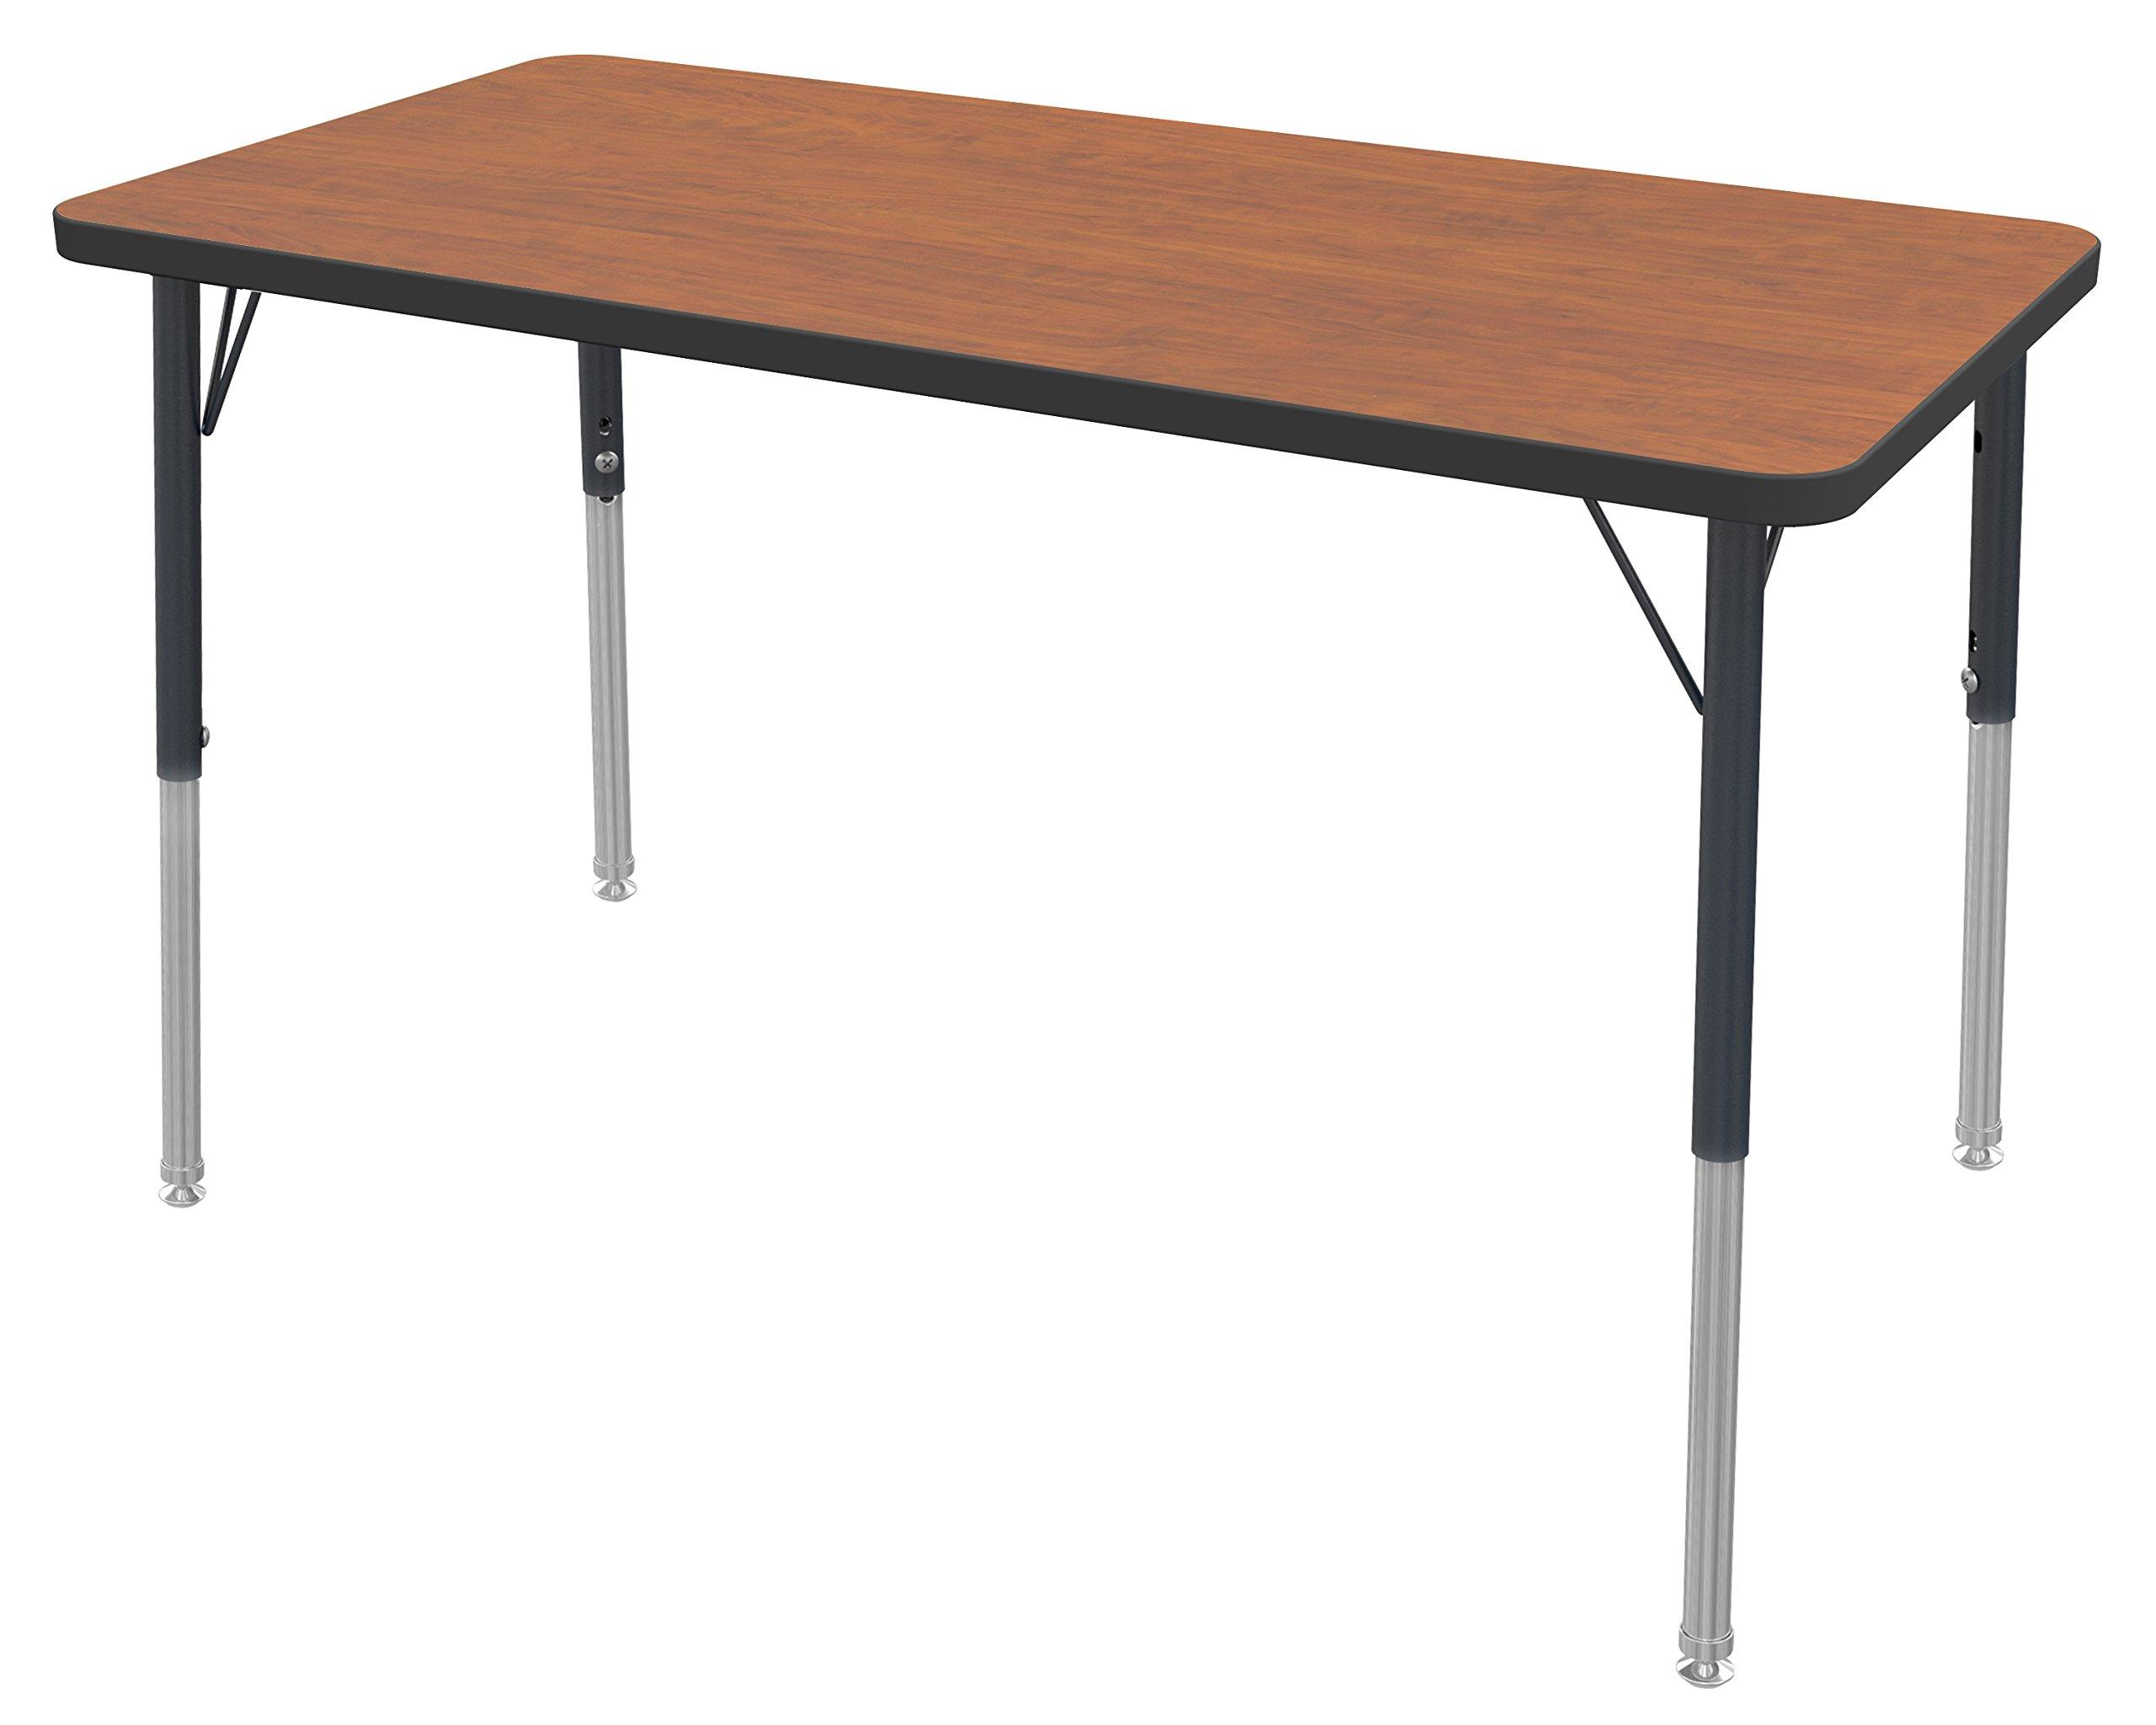 Marco Group Rectangular Adjustable Activity Table, 24'' Width x 36'' Length, Cherry, Black Trim, Standard Legs